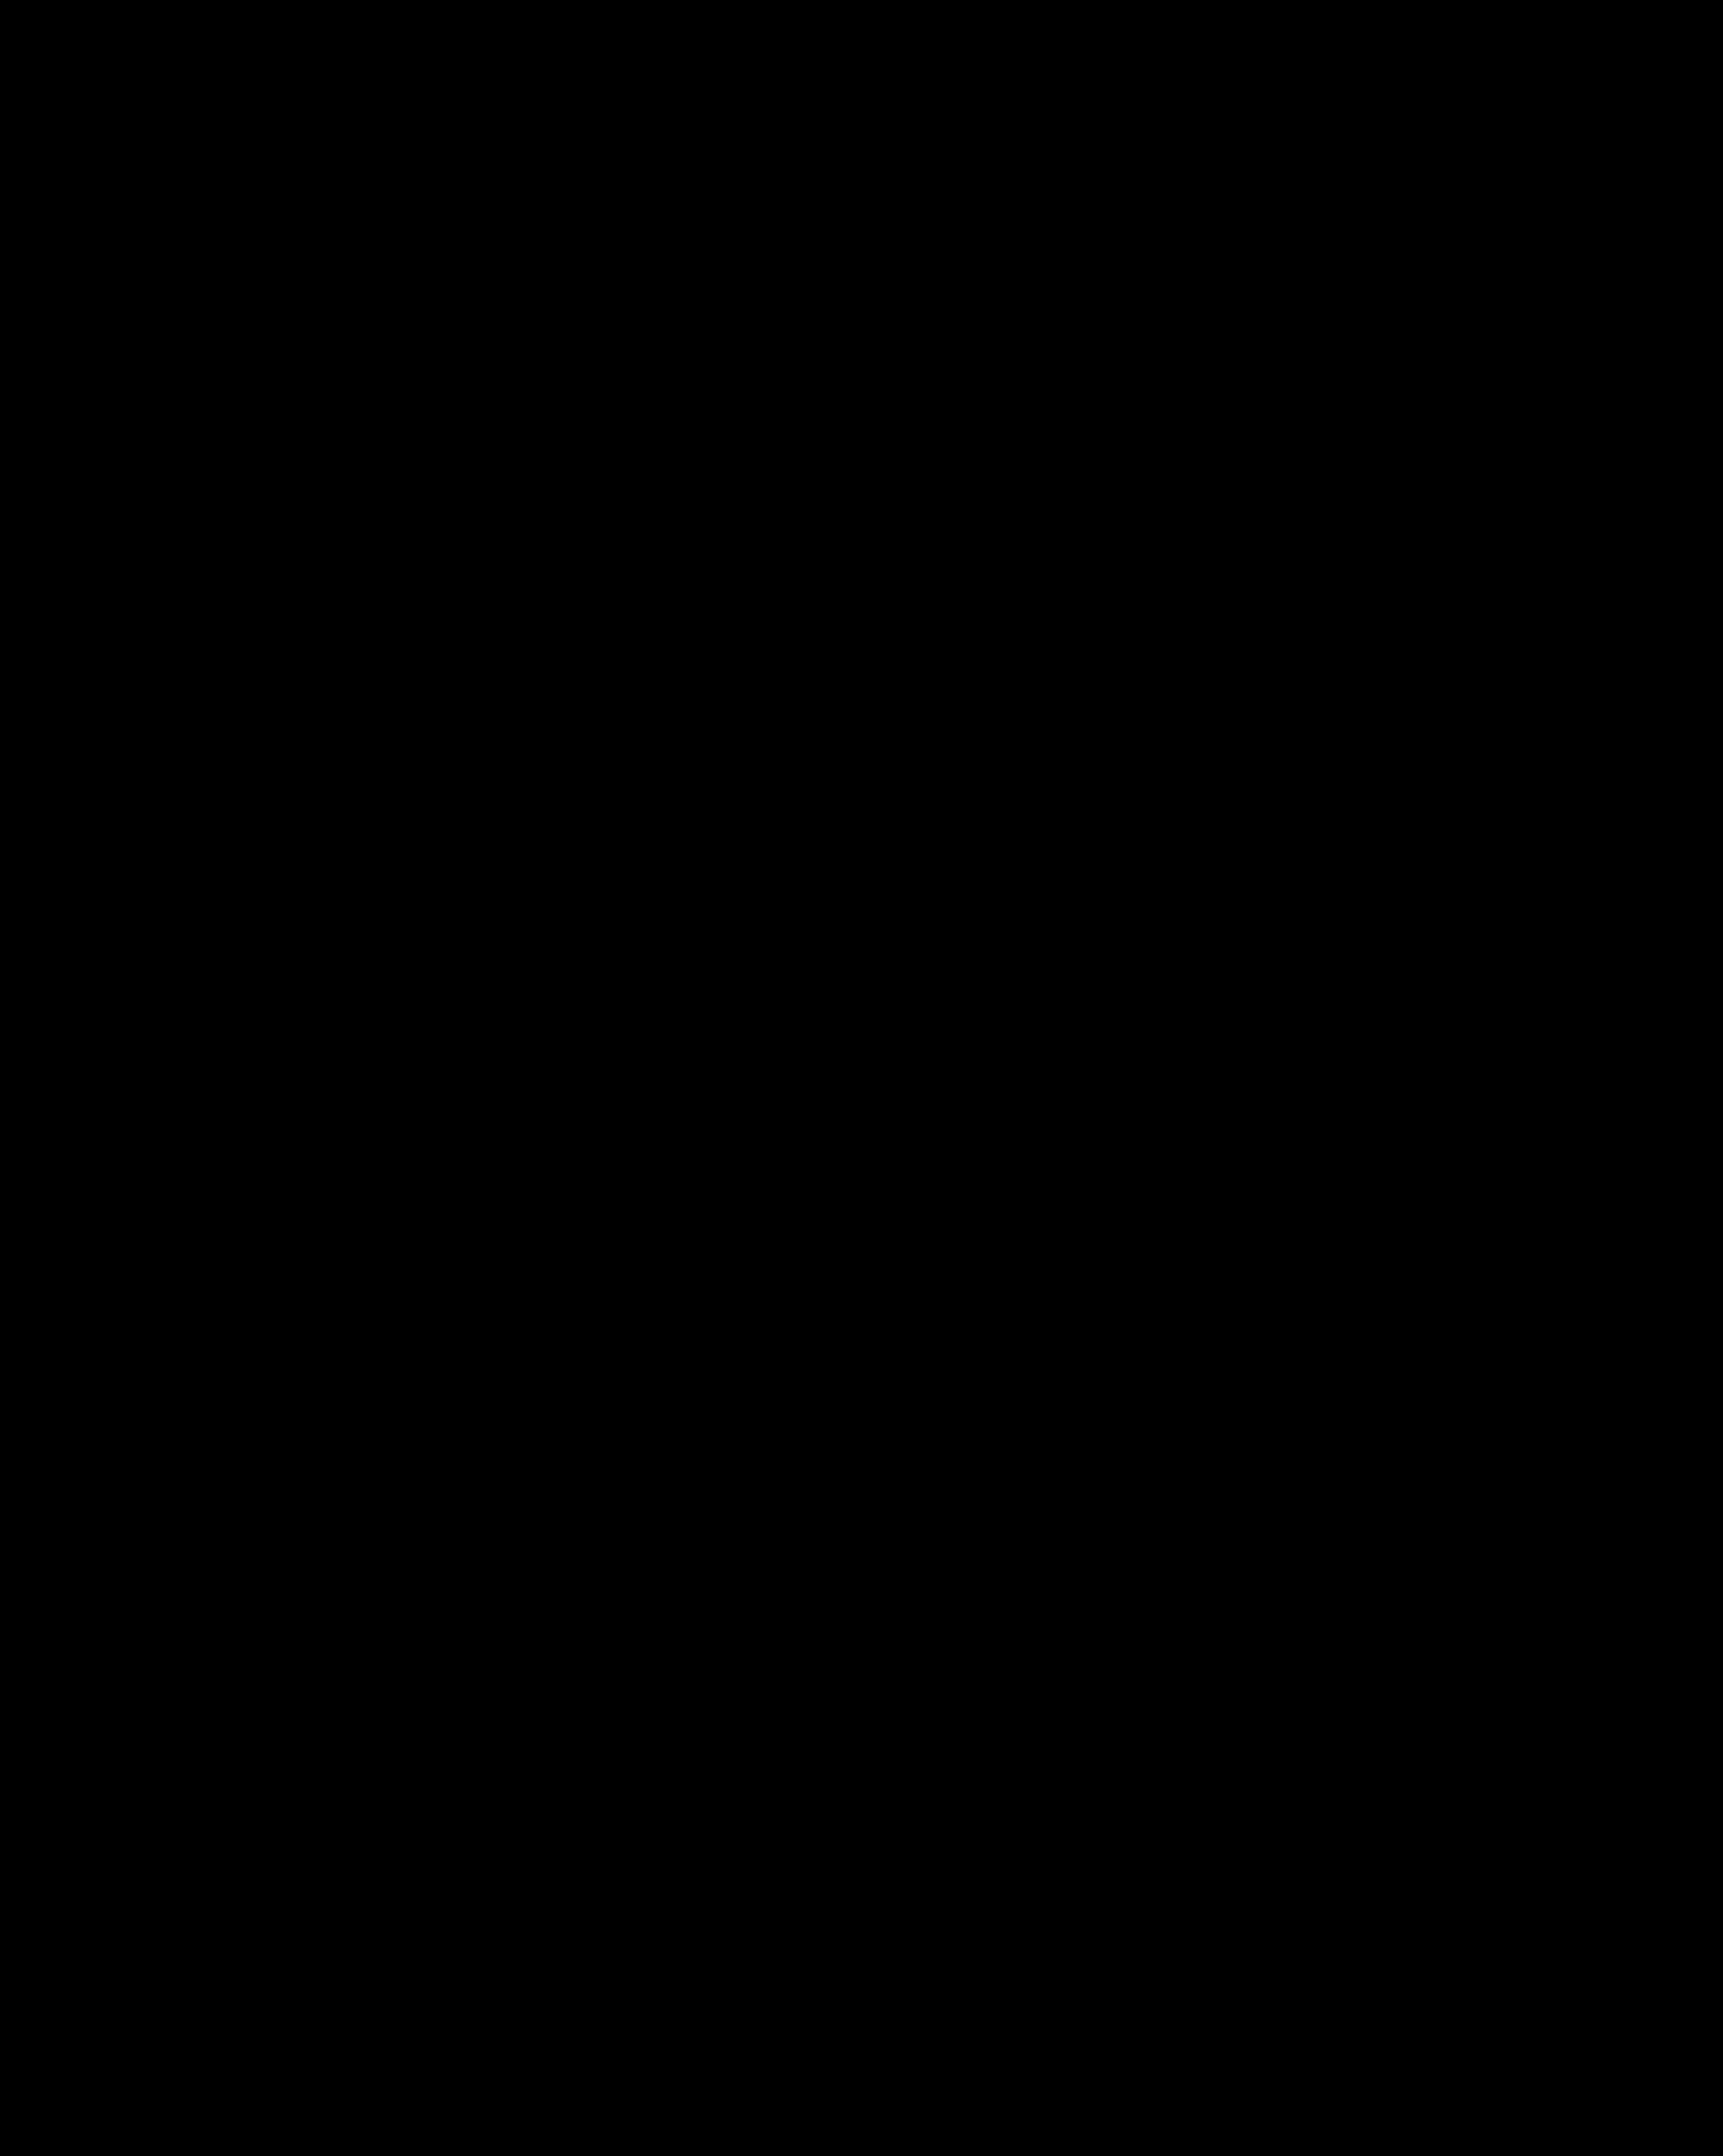 Clipart Leafy Frame 3